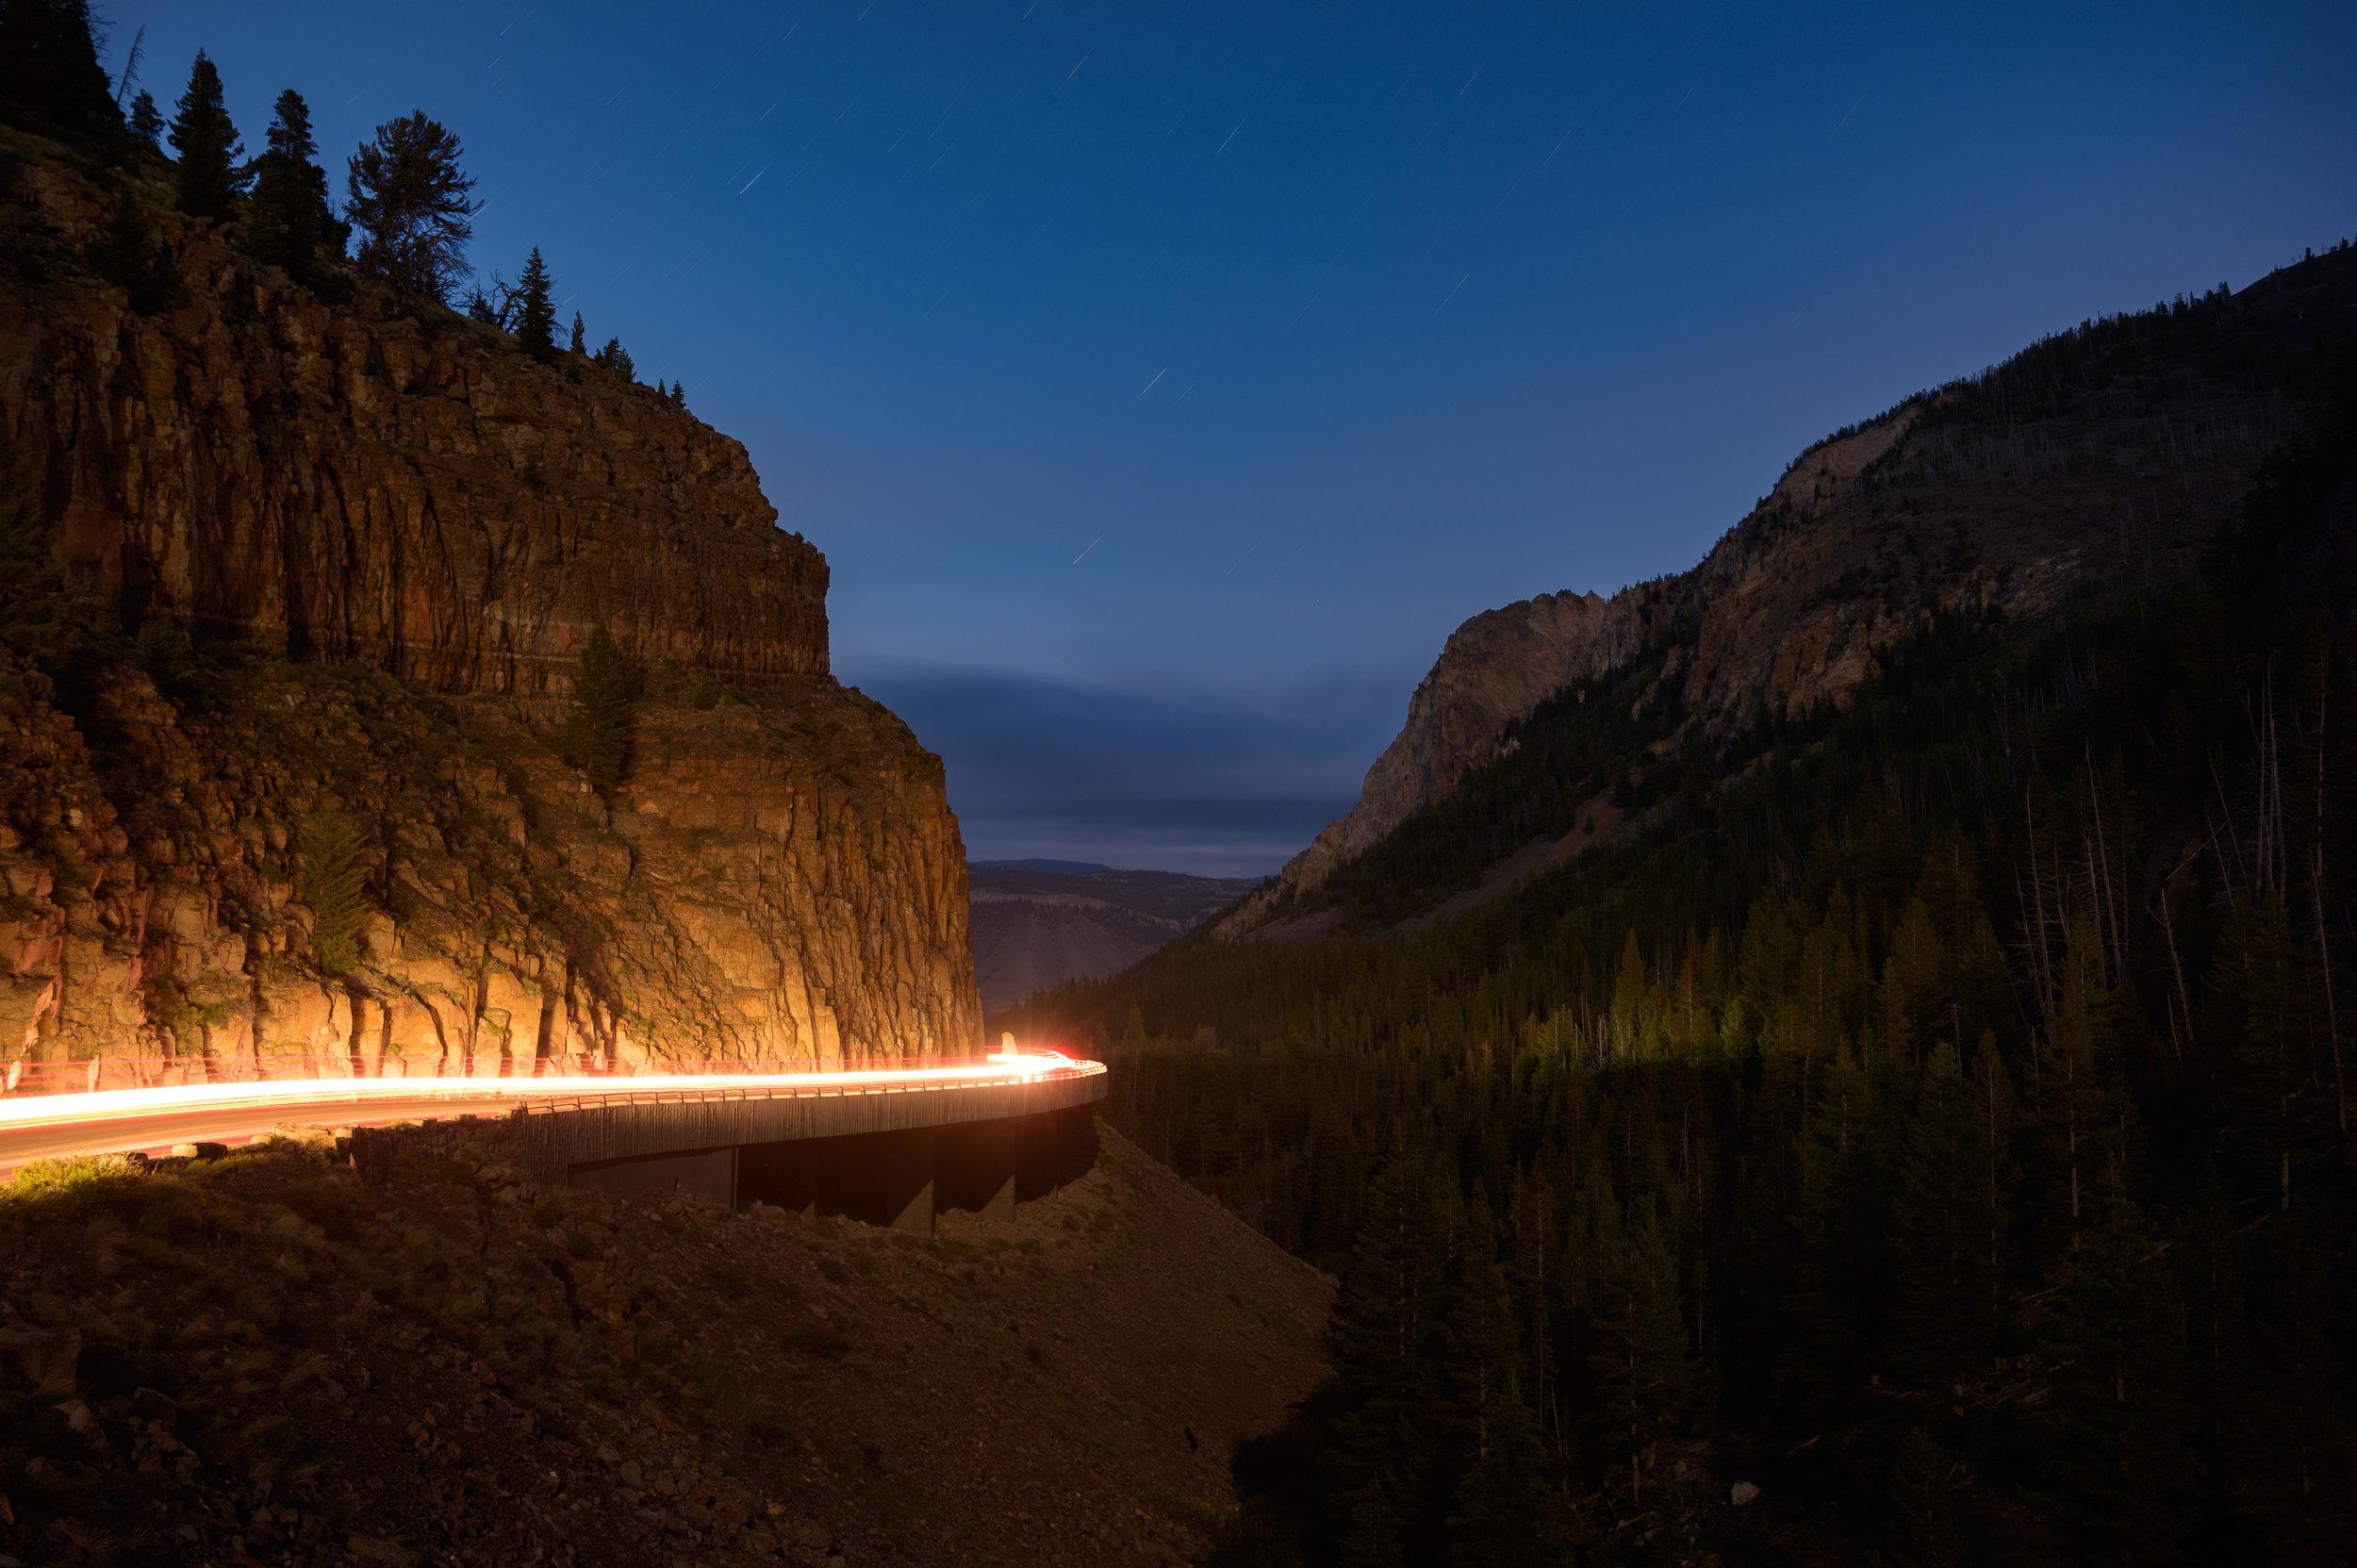 Tims-Yellowstone-2.jpg